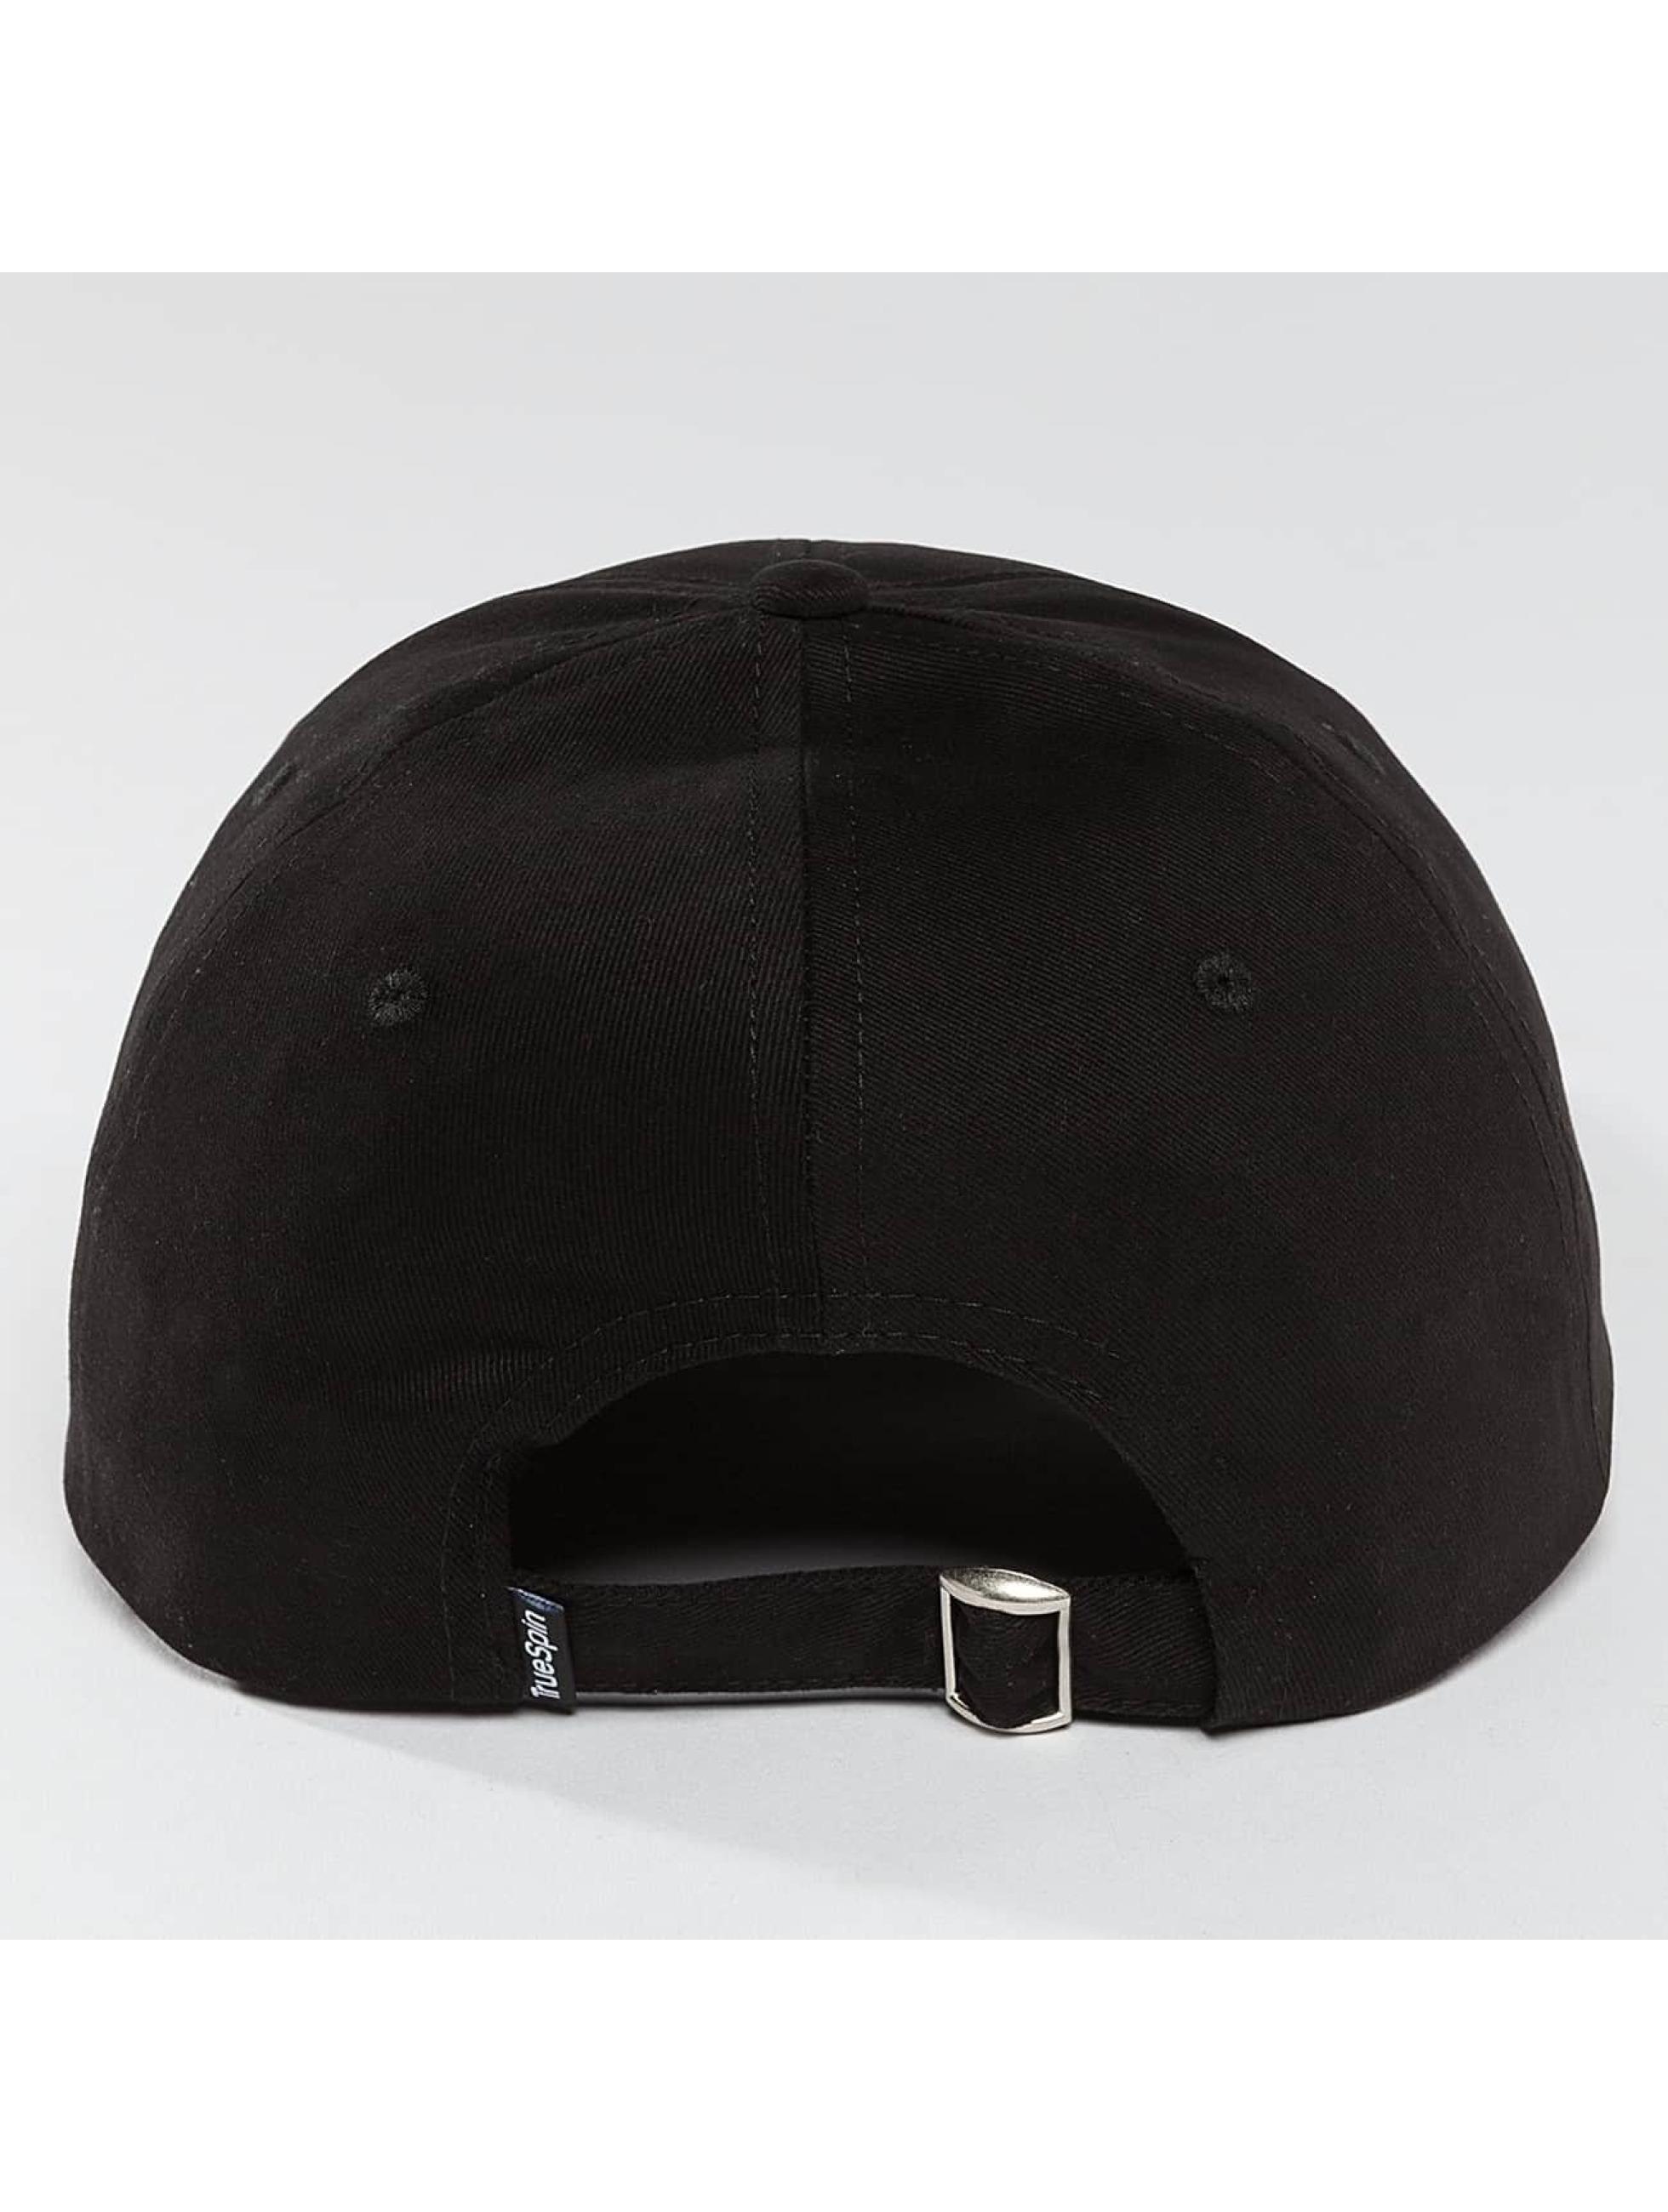 TrueSpin Casquette Snapback & Strapback Anker noir